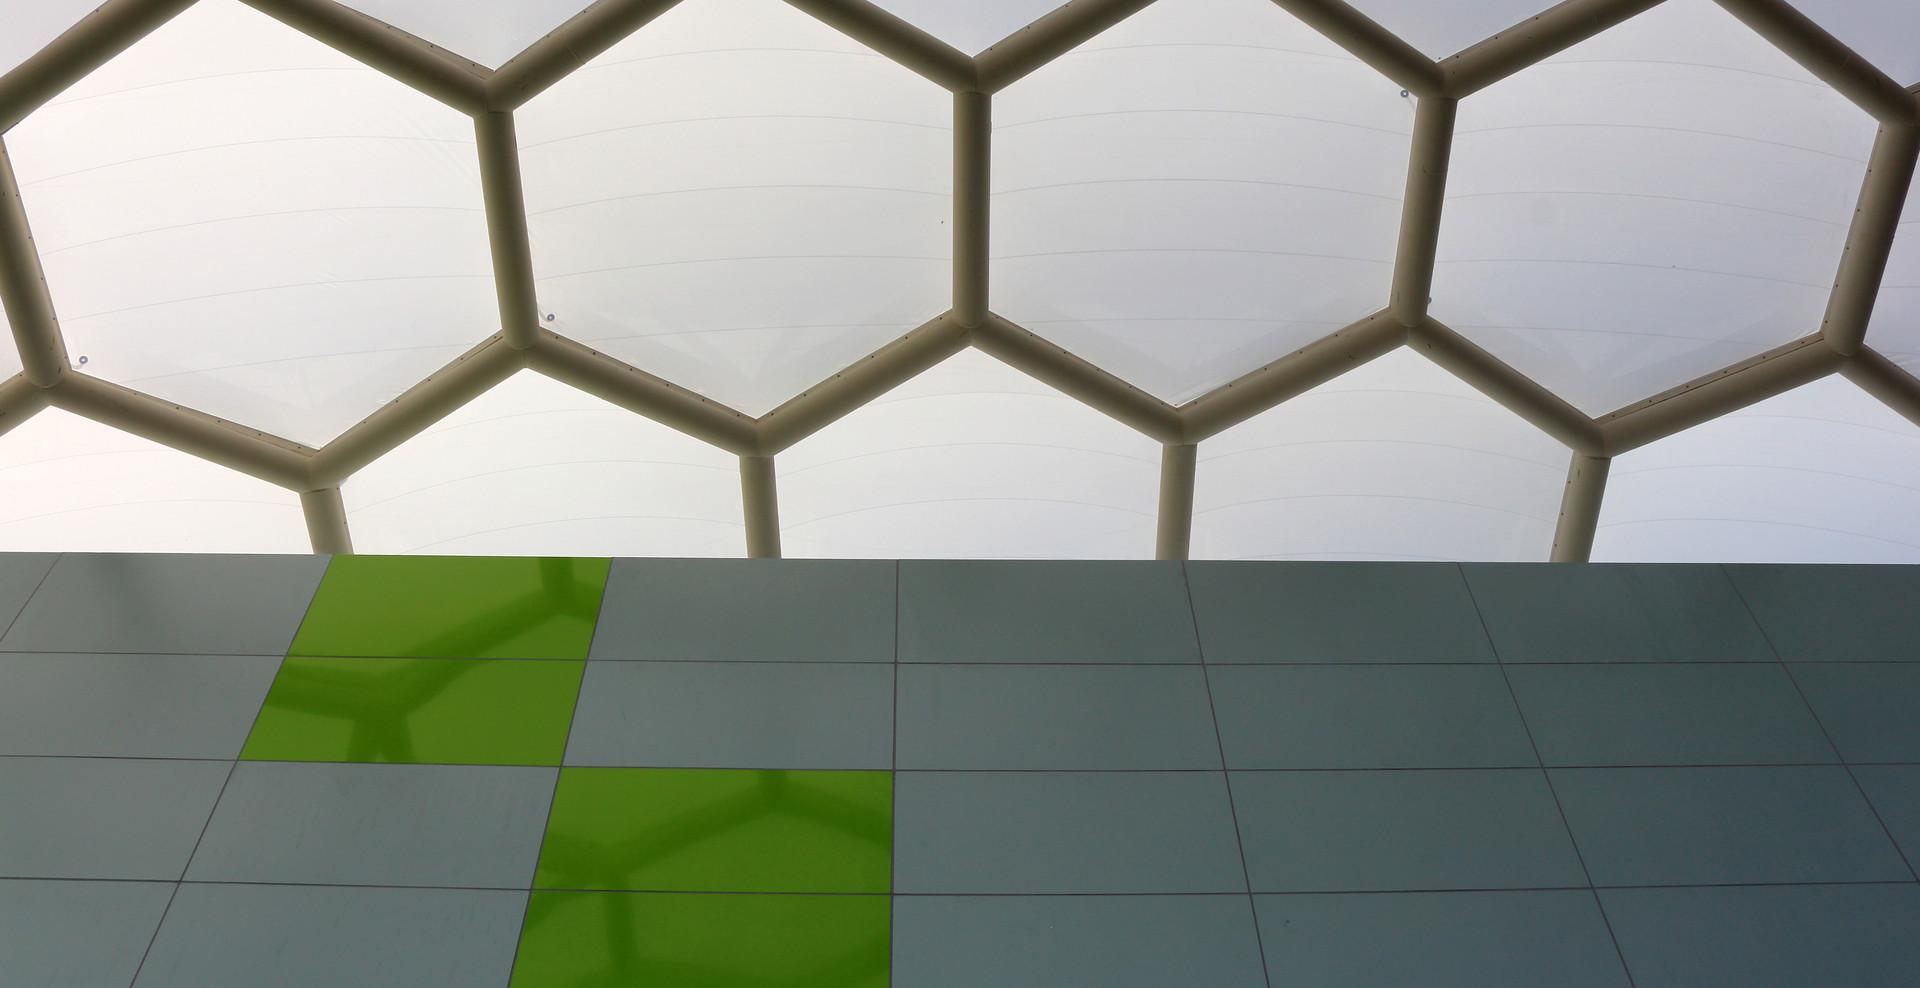 Cubierta- Textile Architektur06w.JPG